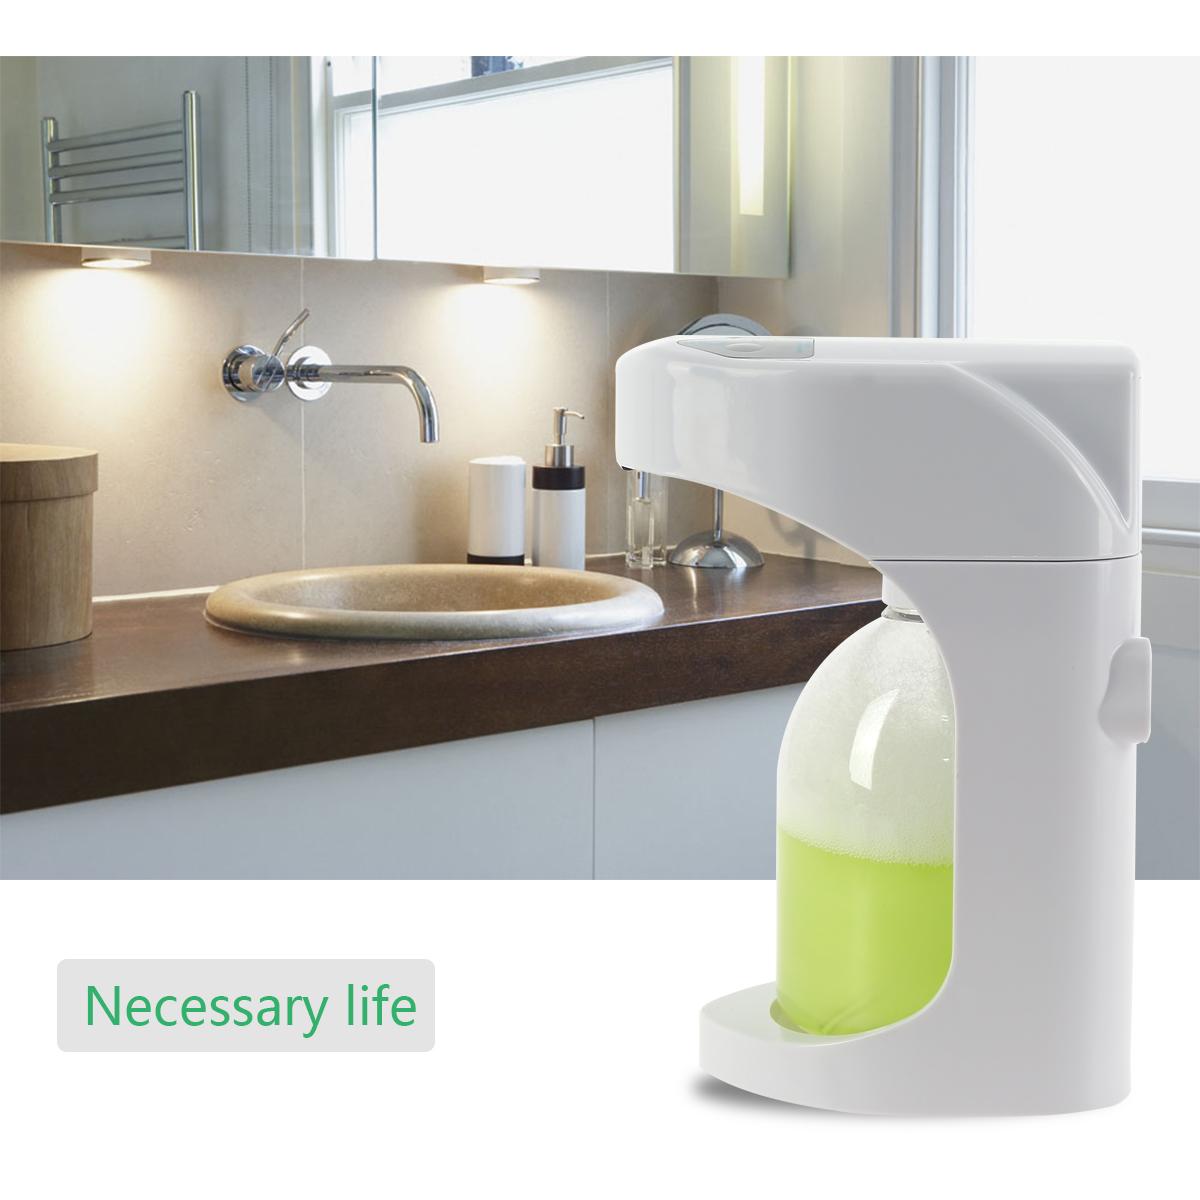 Adjustable Automatic Foam Soap Dispenser Hands Free Foam Bath Touchless Kitchen Ebay